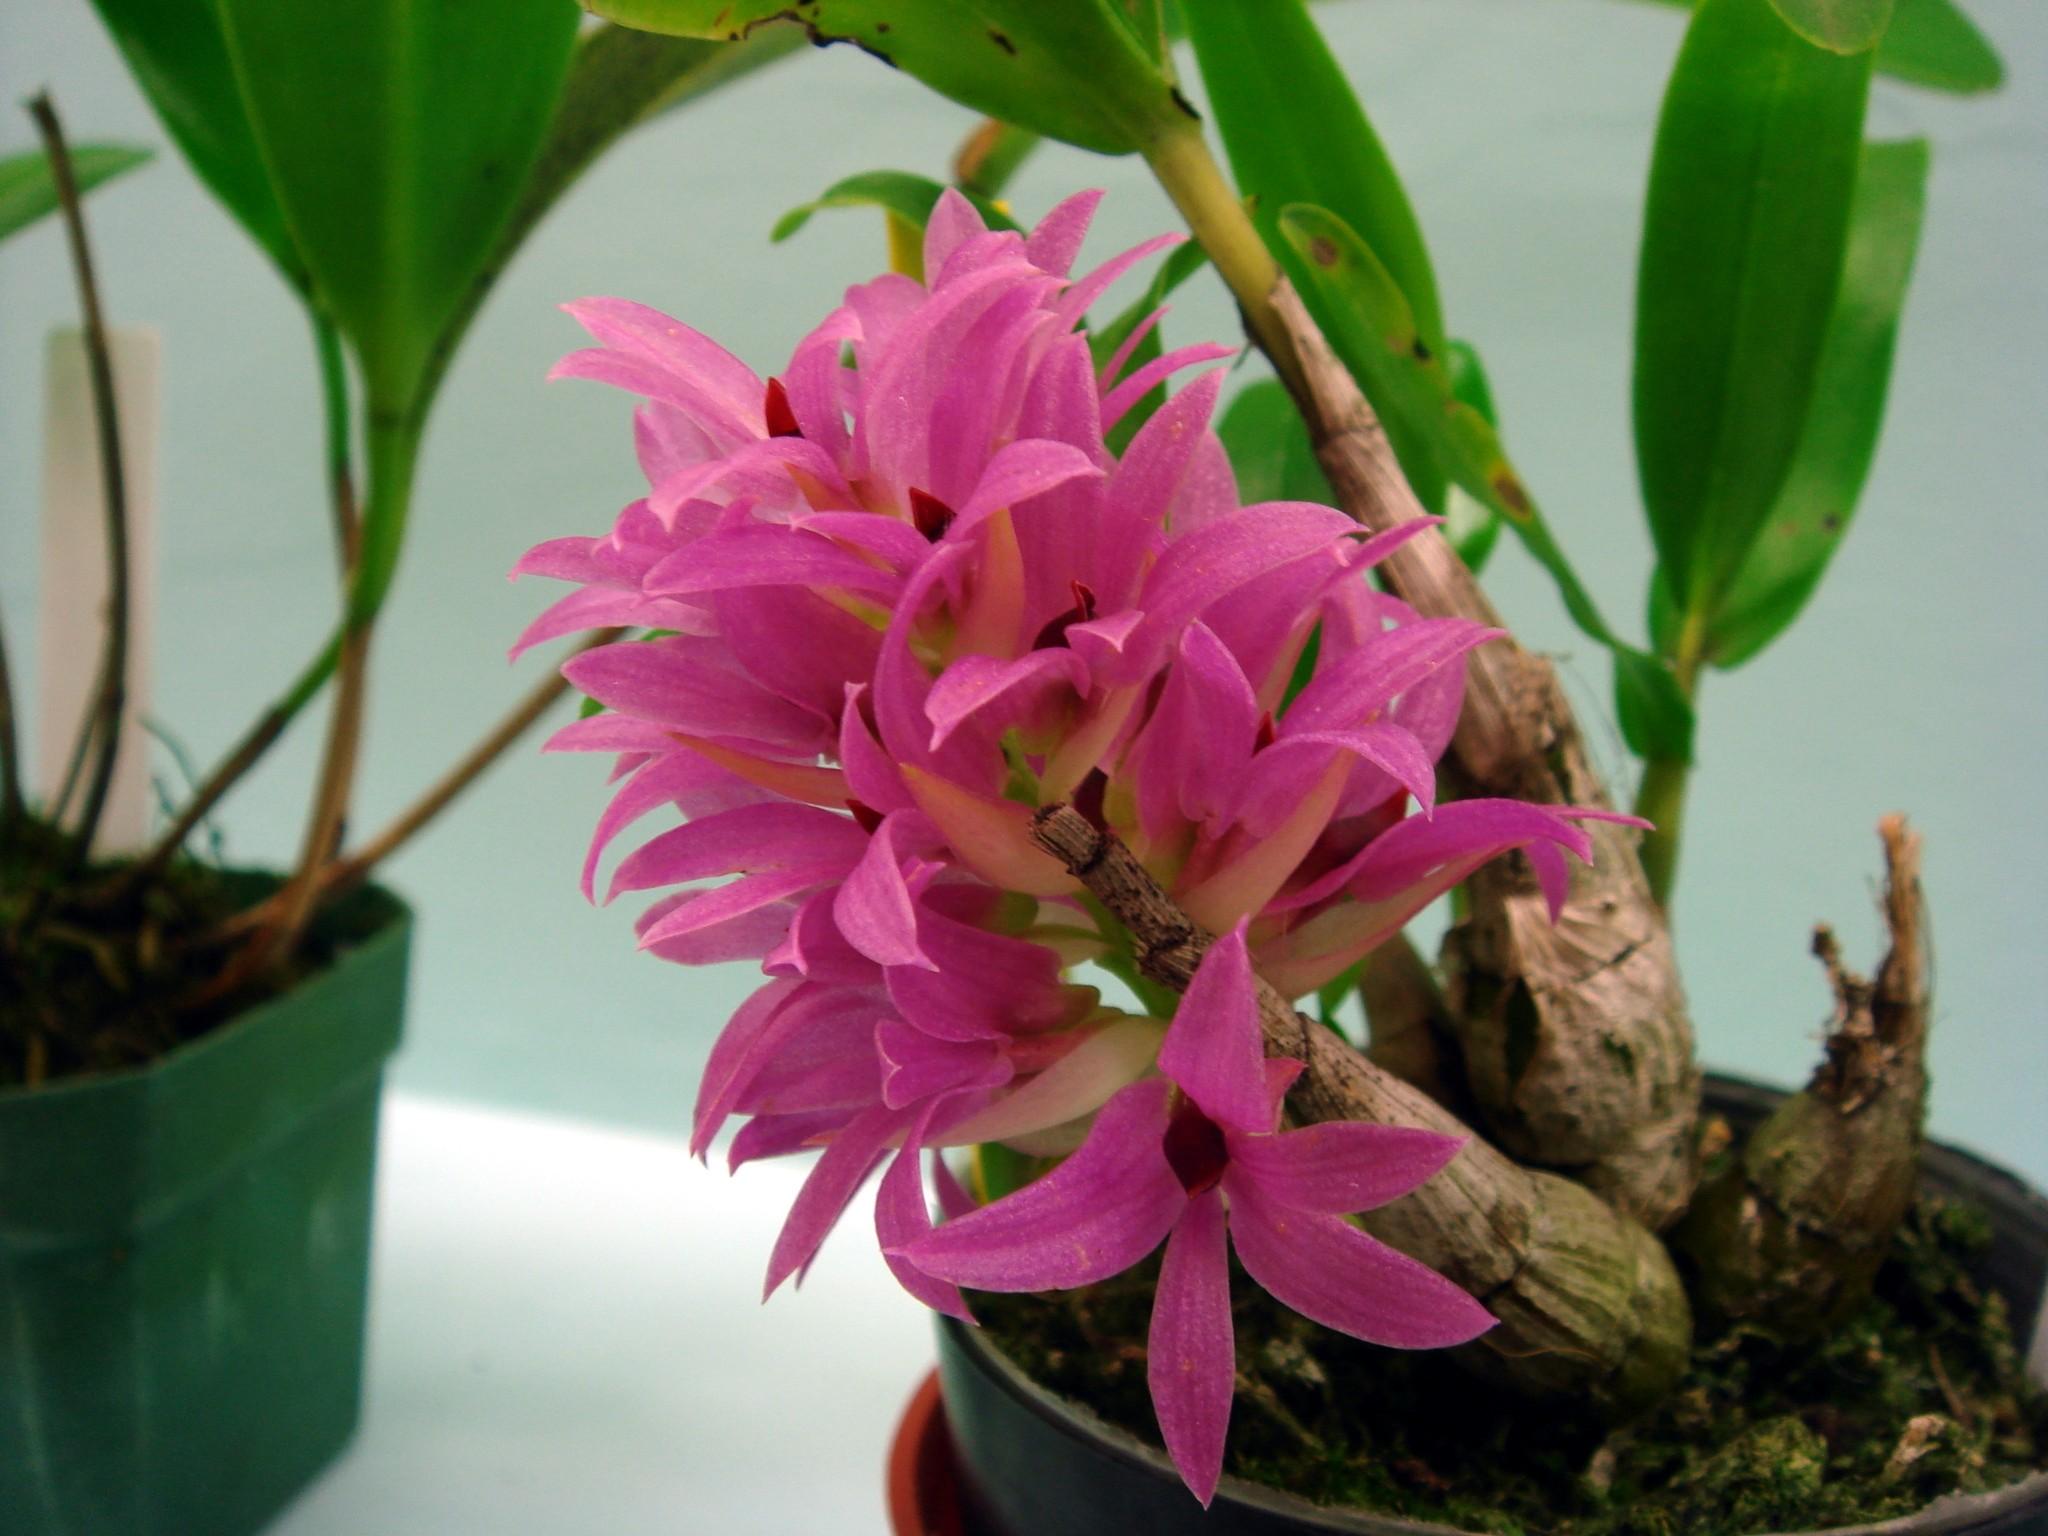 http://orchids.la.coocan.jp/Dendrobium/Dendrobium%20bracteosum/DSC08037.JPG